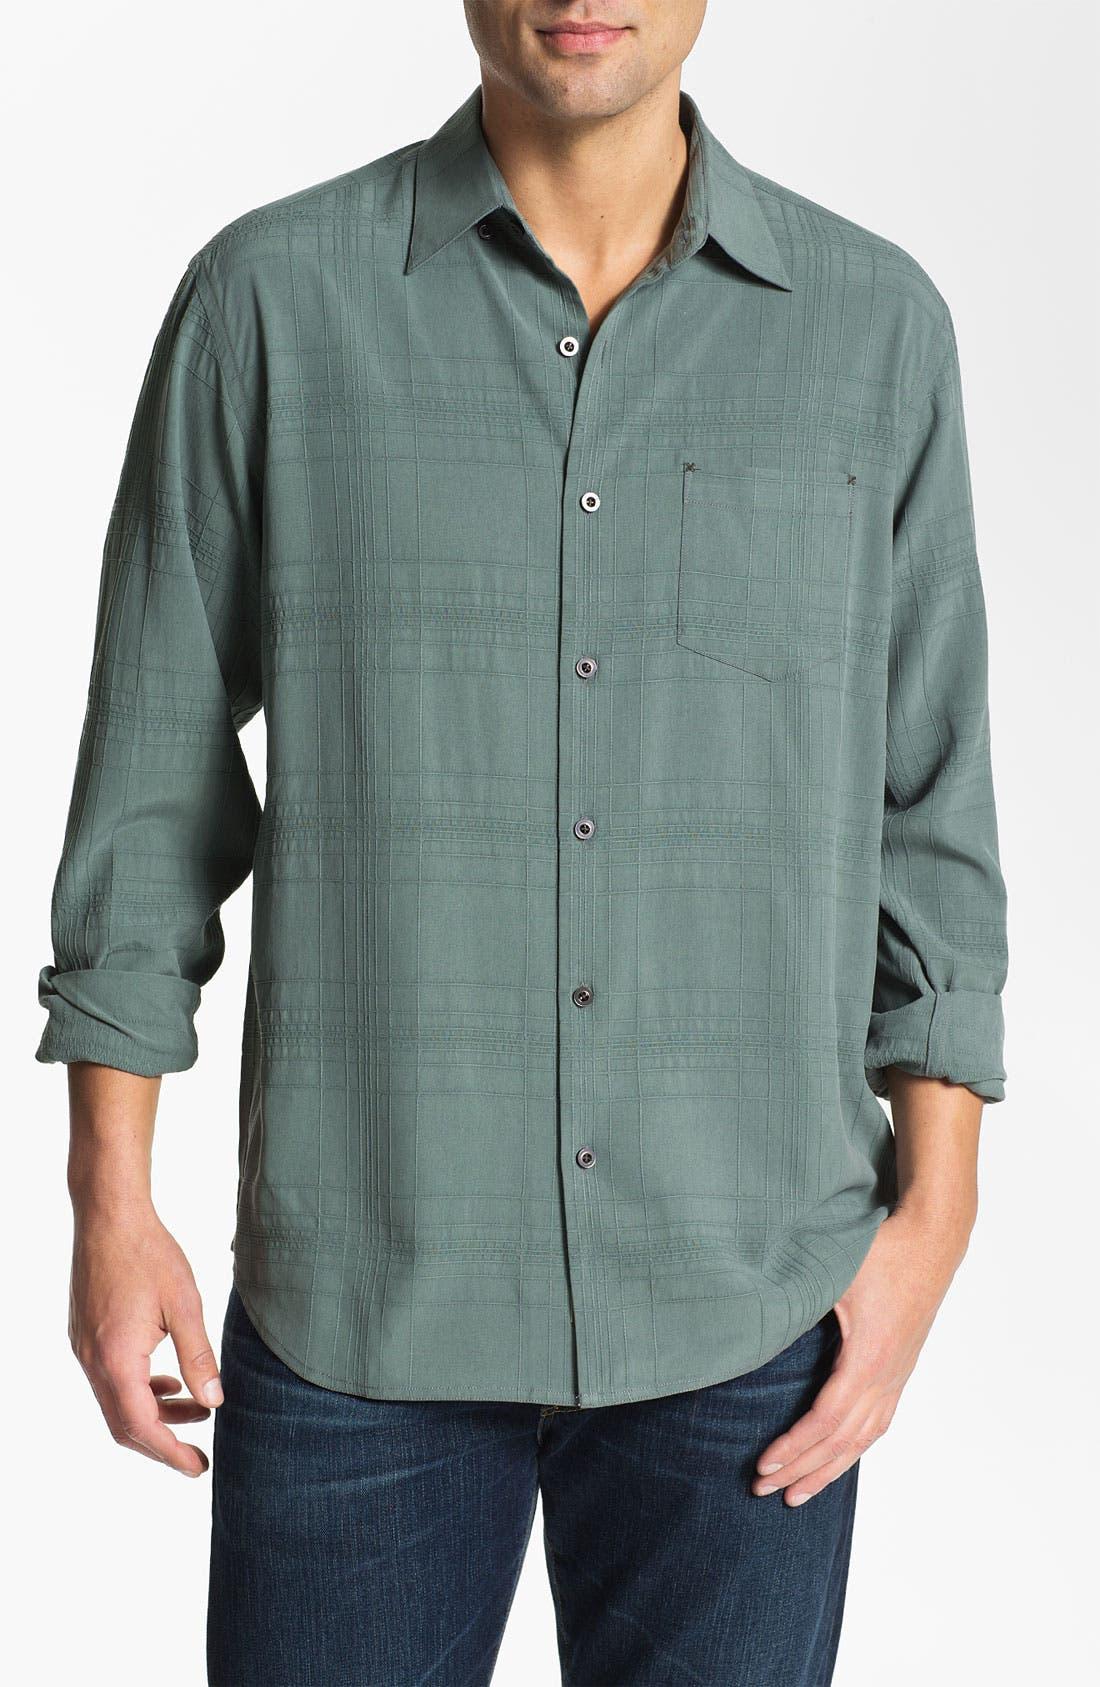 Alternate Image 1 Selected - Tommy Bahama 'Skyscraper' Silk Sport Shirt (Big & Tall)